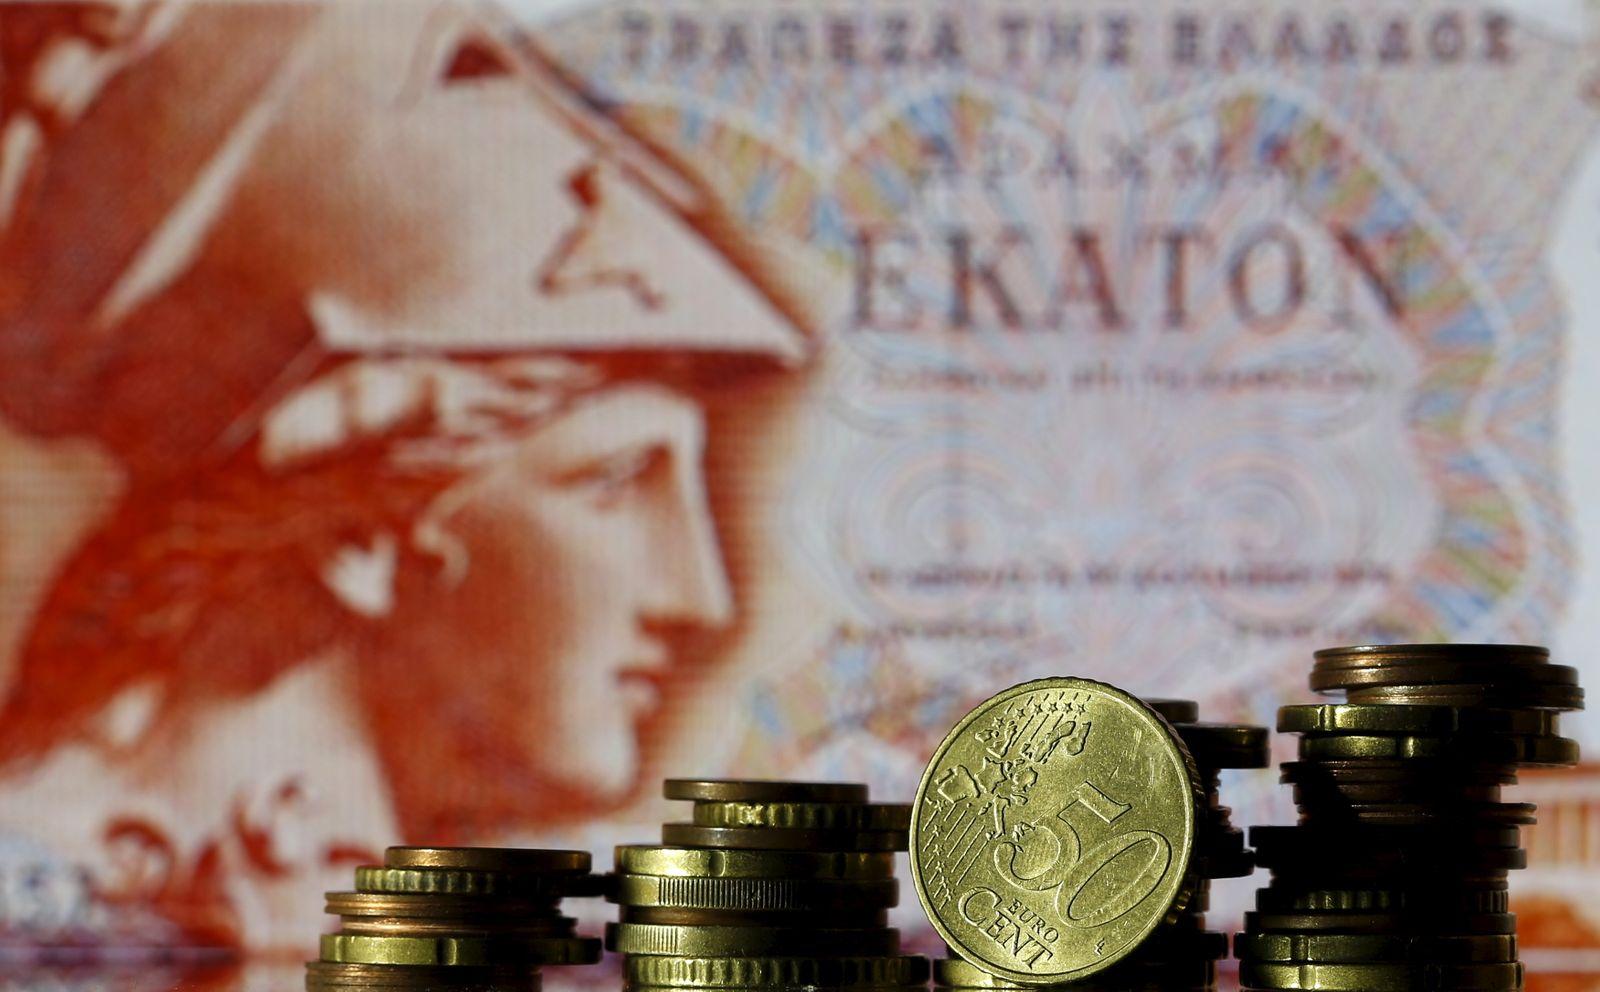 Griechenland; Drachme (Athena) vor Euro; closeup